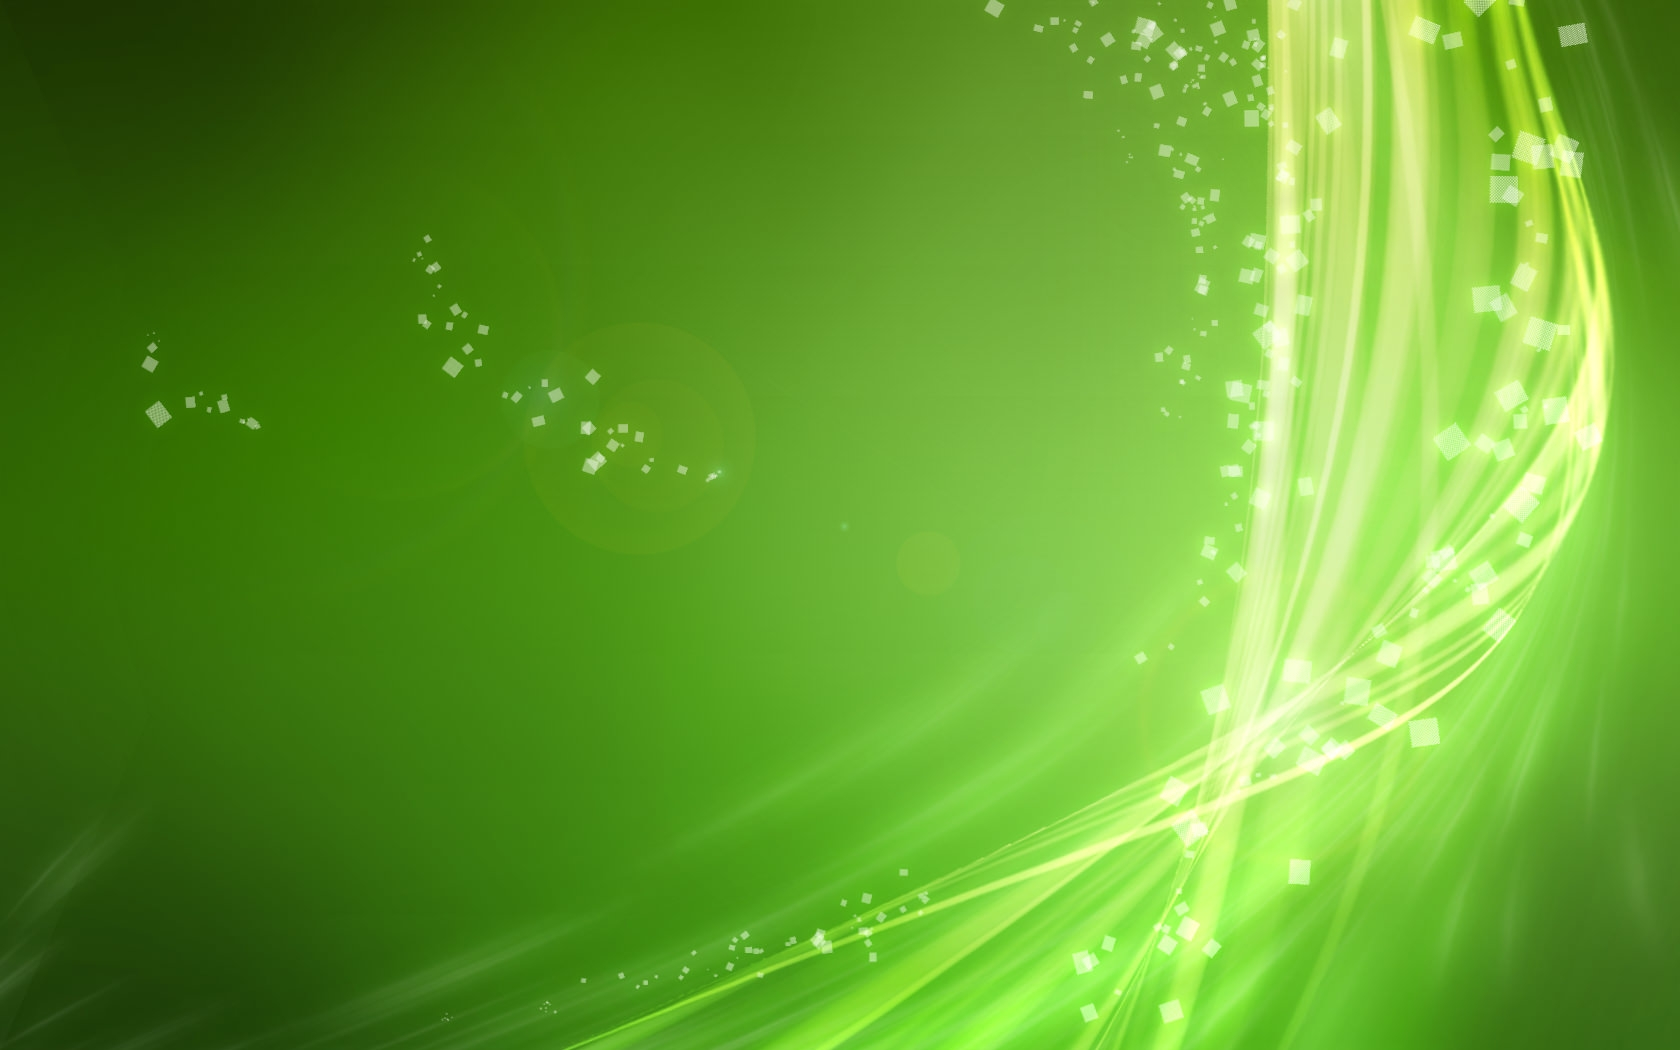 Computer Green Abstract Wallpaper